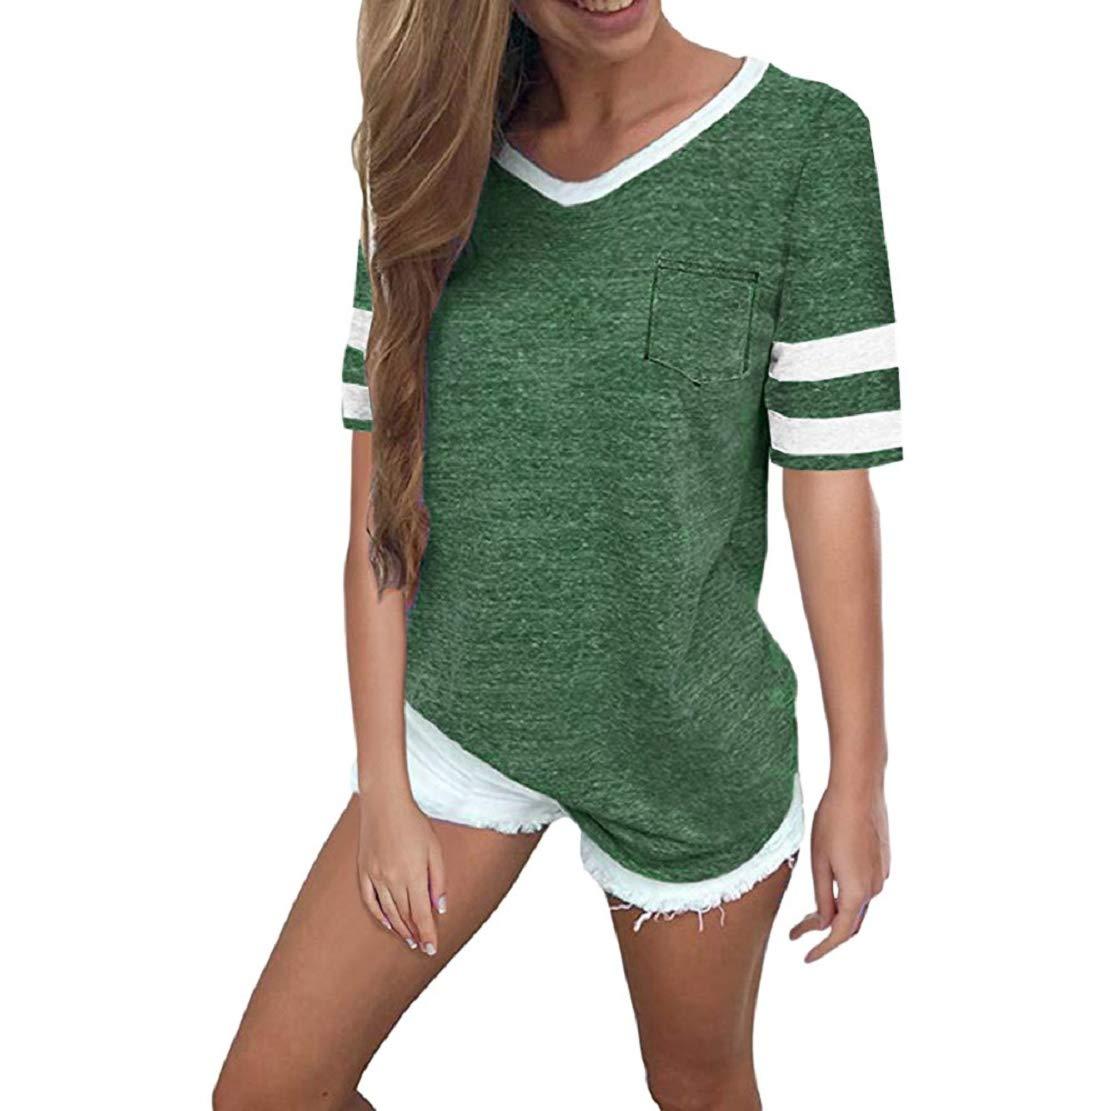 Women Summer Casual Short Sleeve V Neck T Shirt Striped Print Baseball T-Shirt Blouse Tops by Lowprofile Green